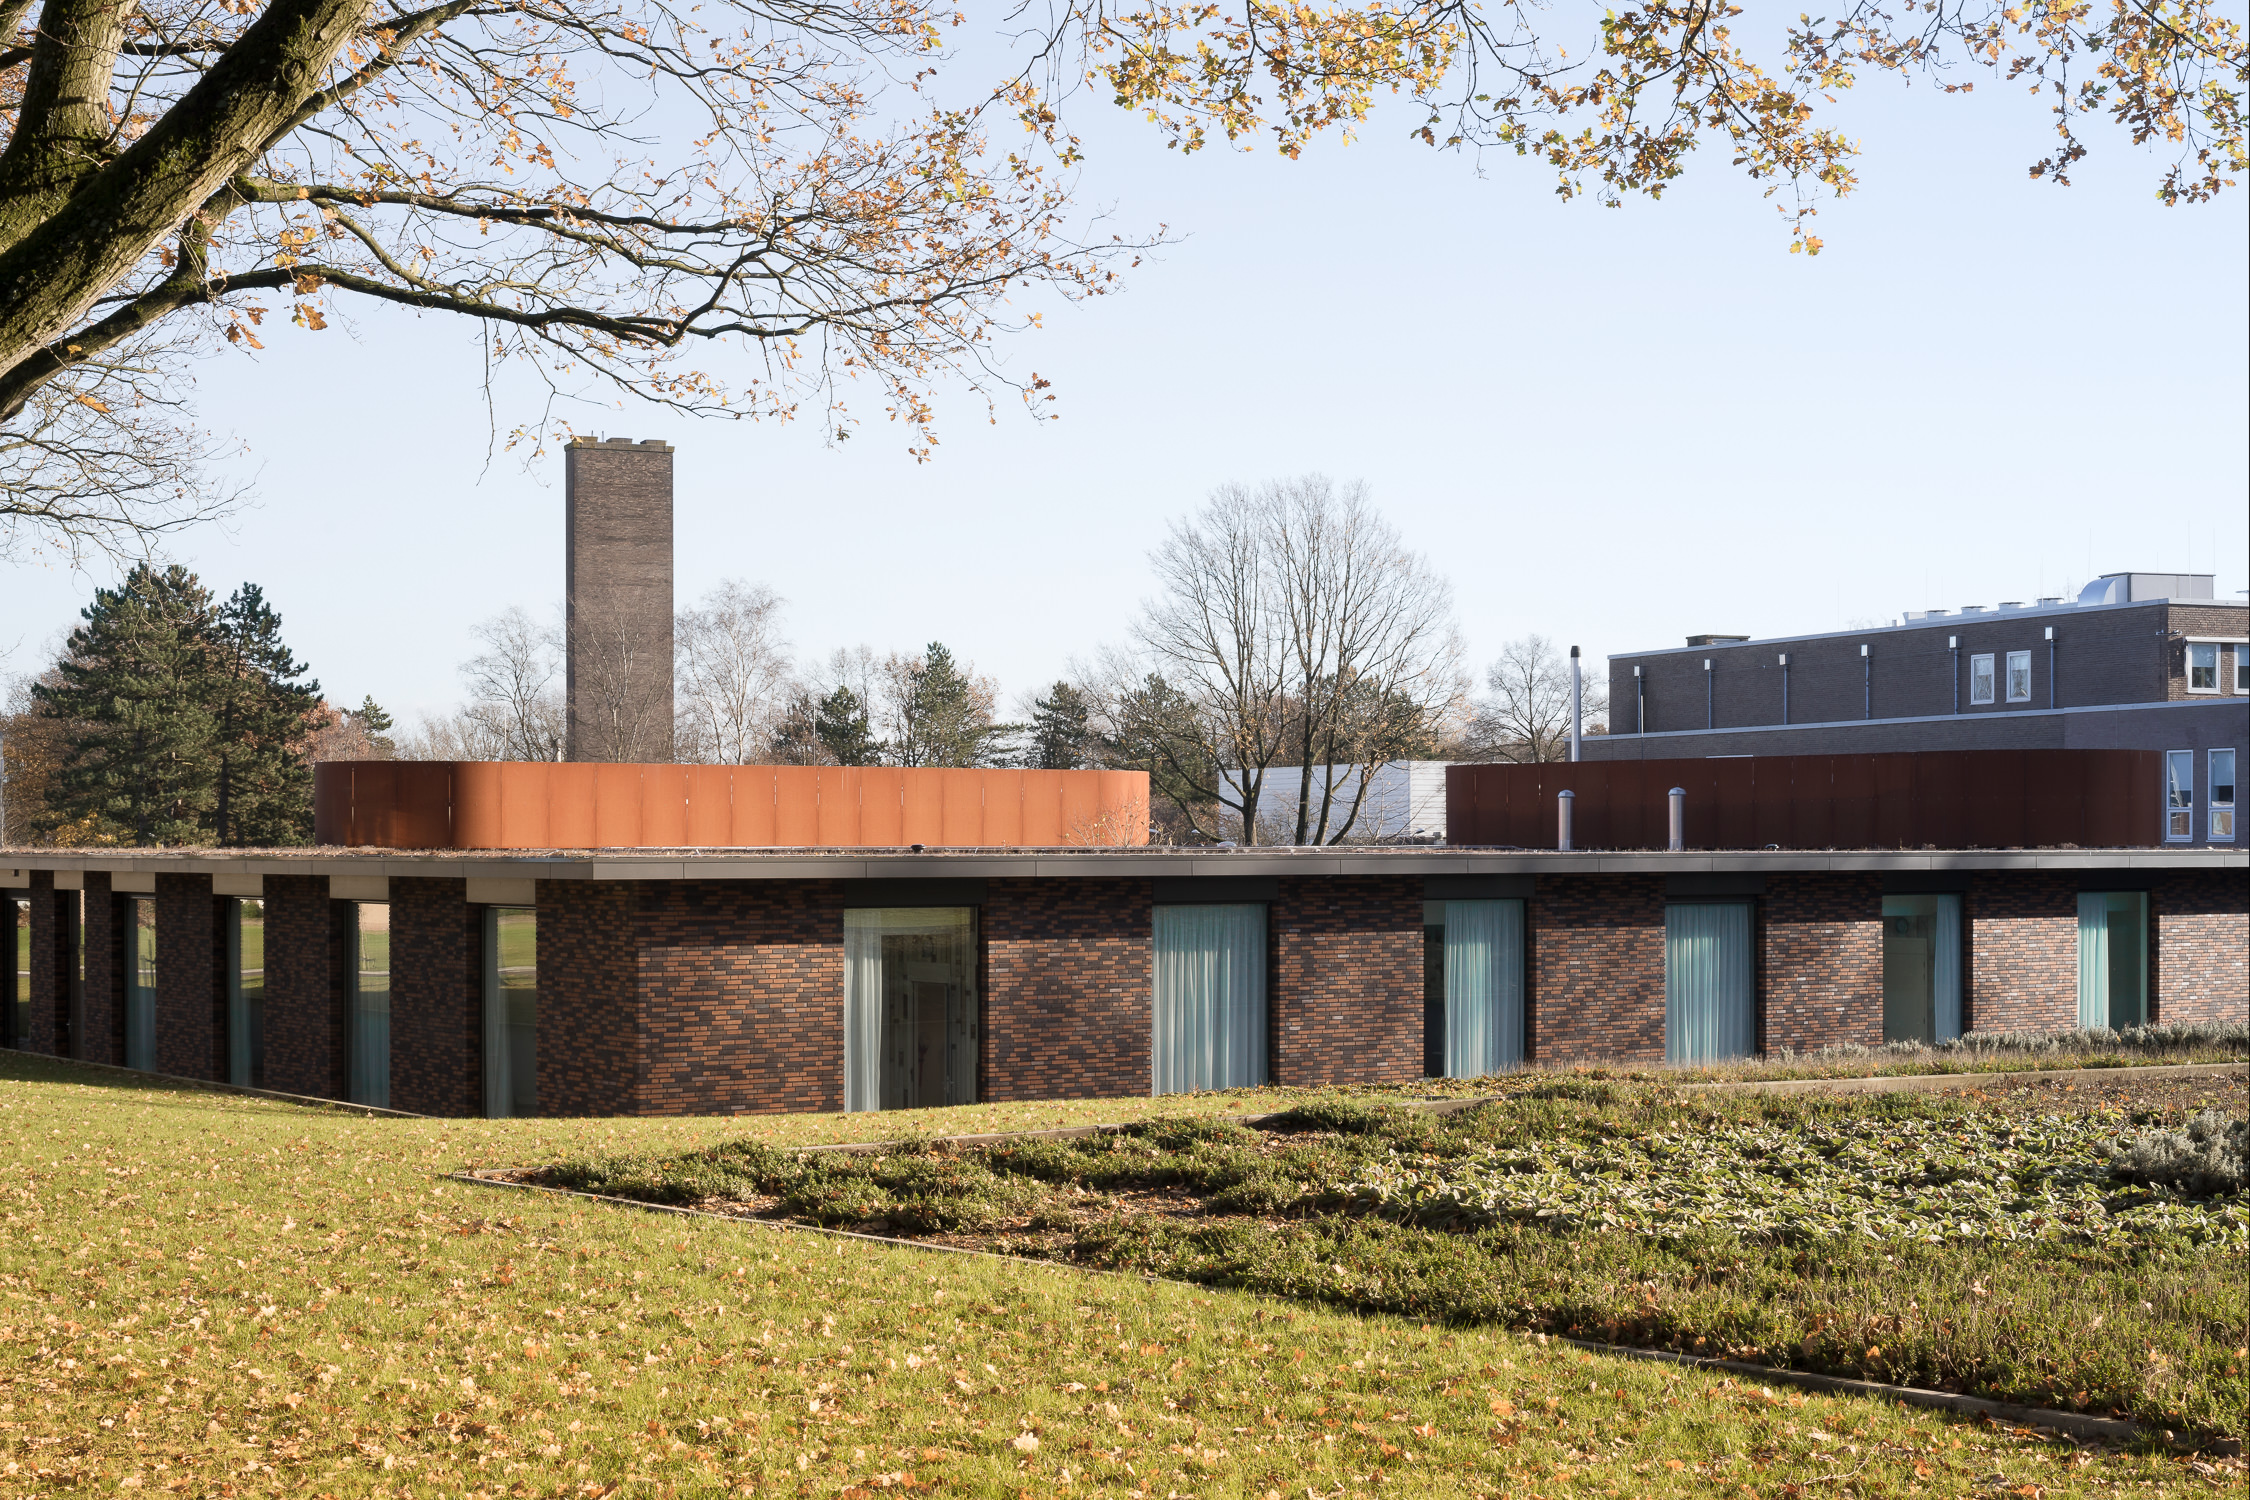 team-4-groningen-haren-beatrixoord-mark-hadden-amsterdam-architecture-photographer-architectuurfotograaf-056.jpg